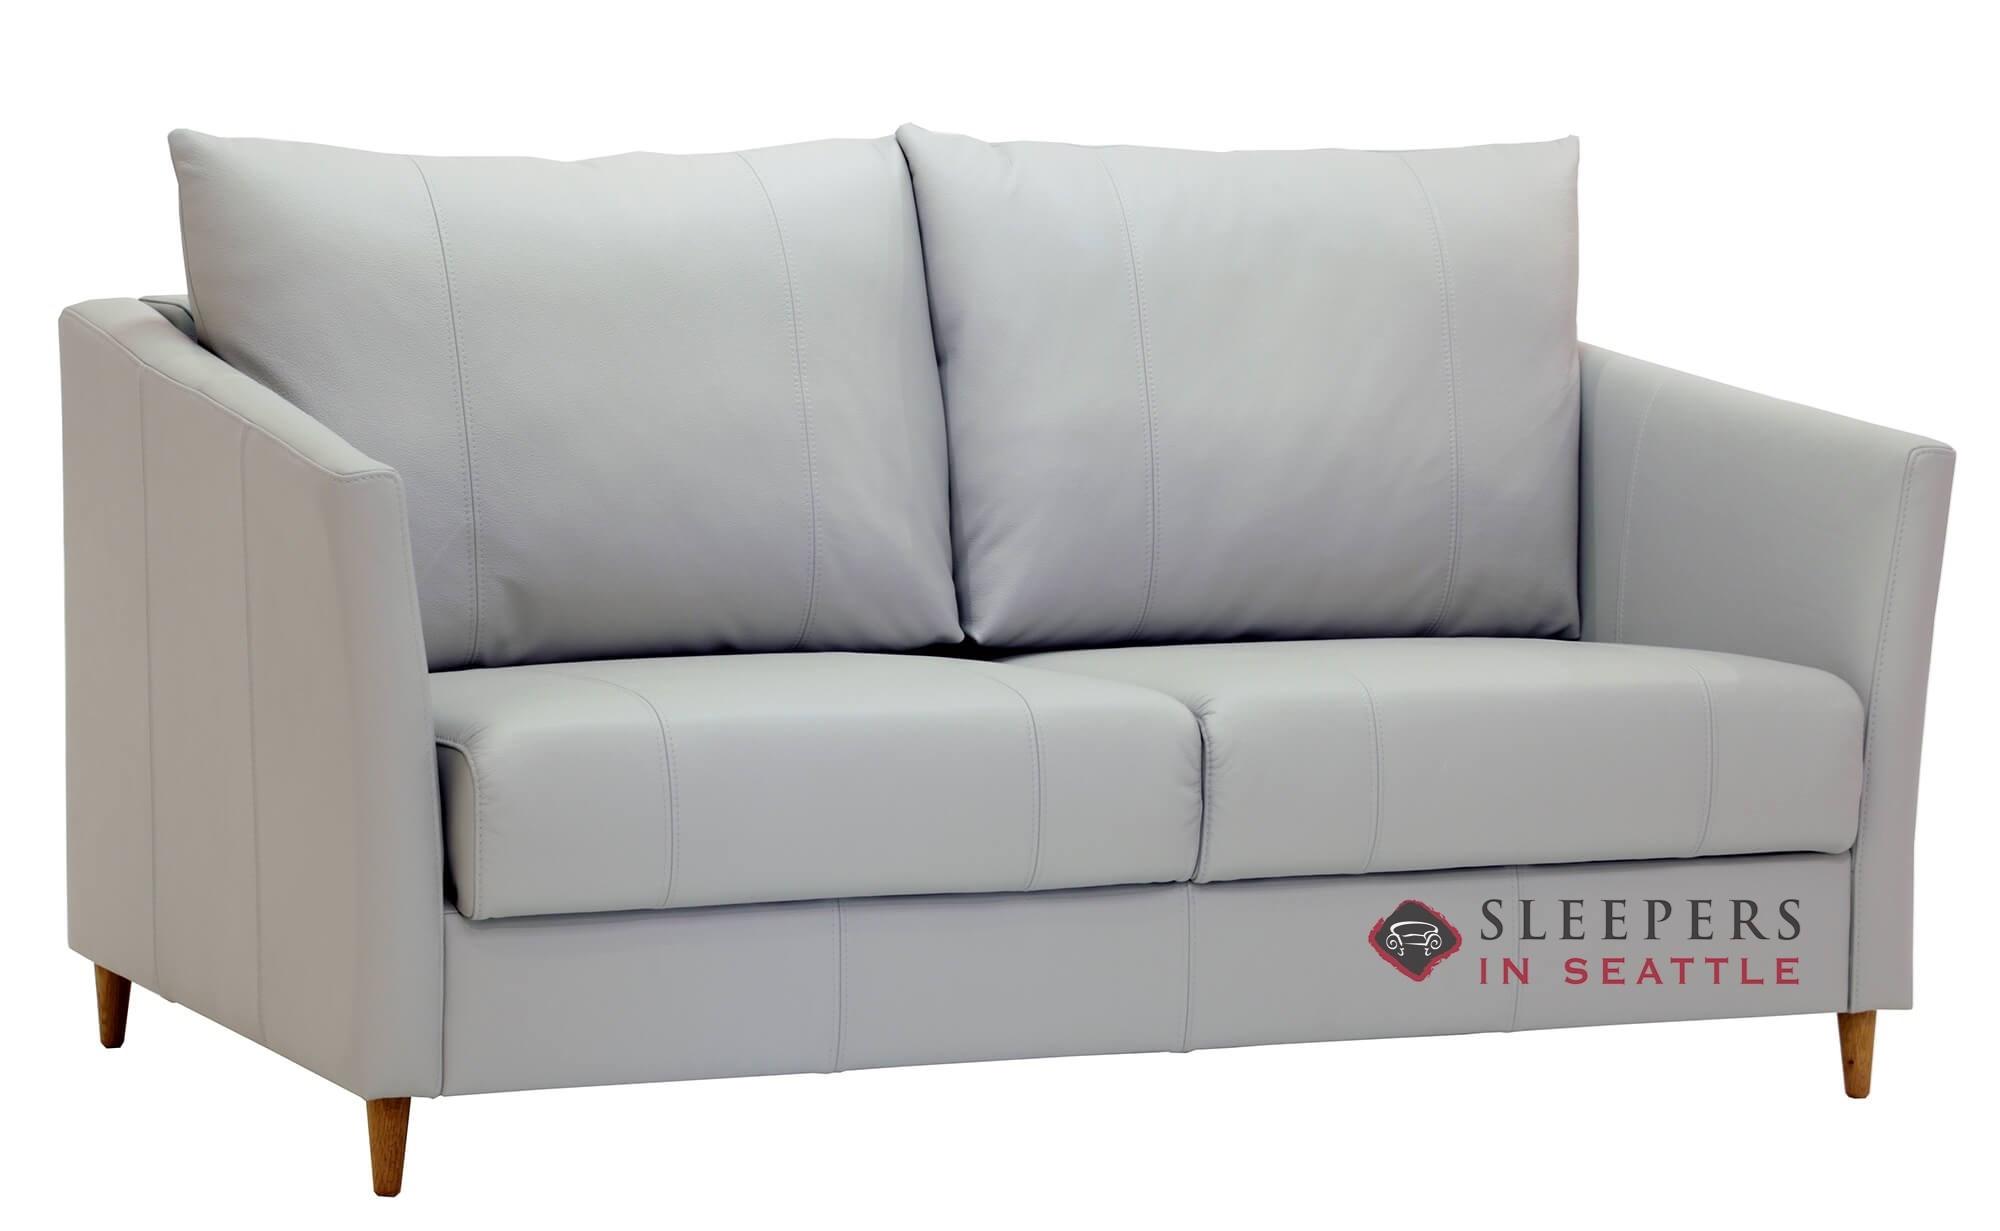 Marvelous Luonto Erika Queen Leather Sleeper Sofa Theyellowbook Wood Chair Design Ideas Theyellowbookinfo